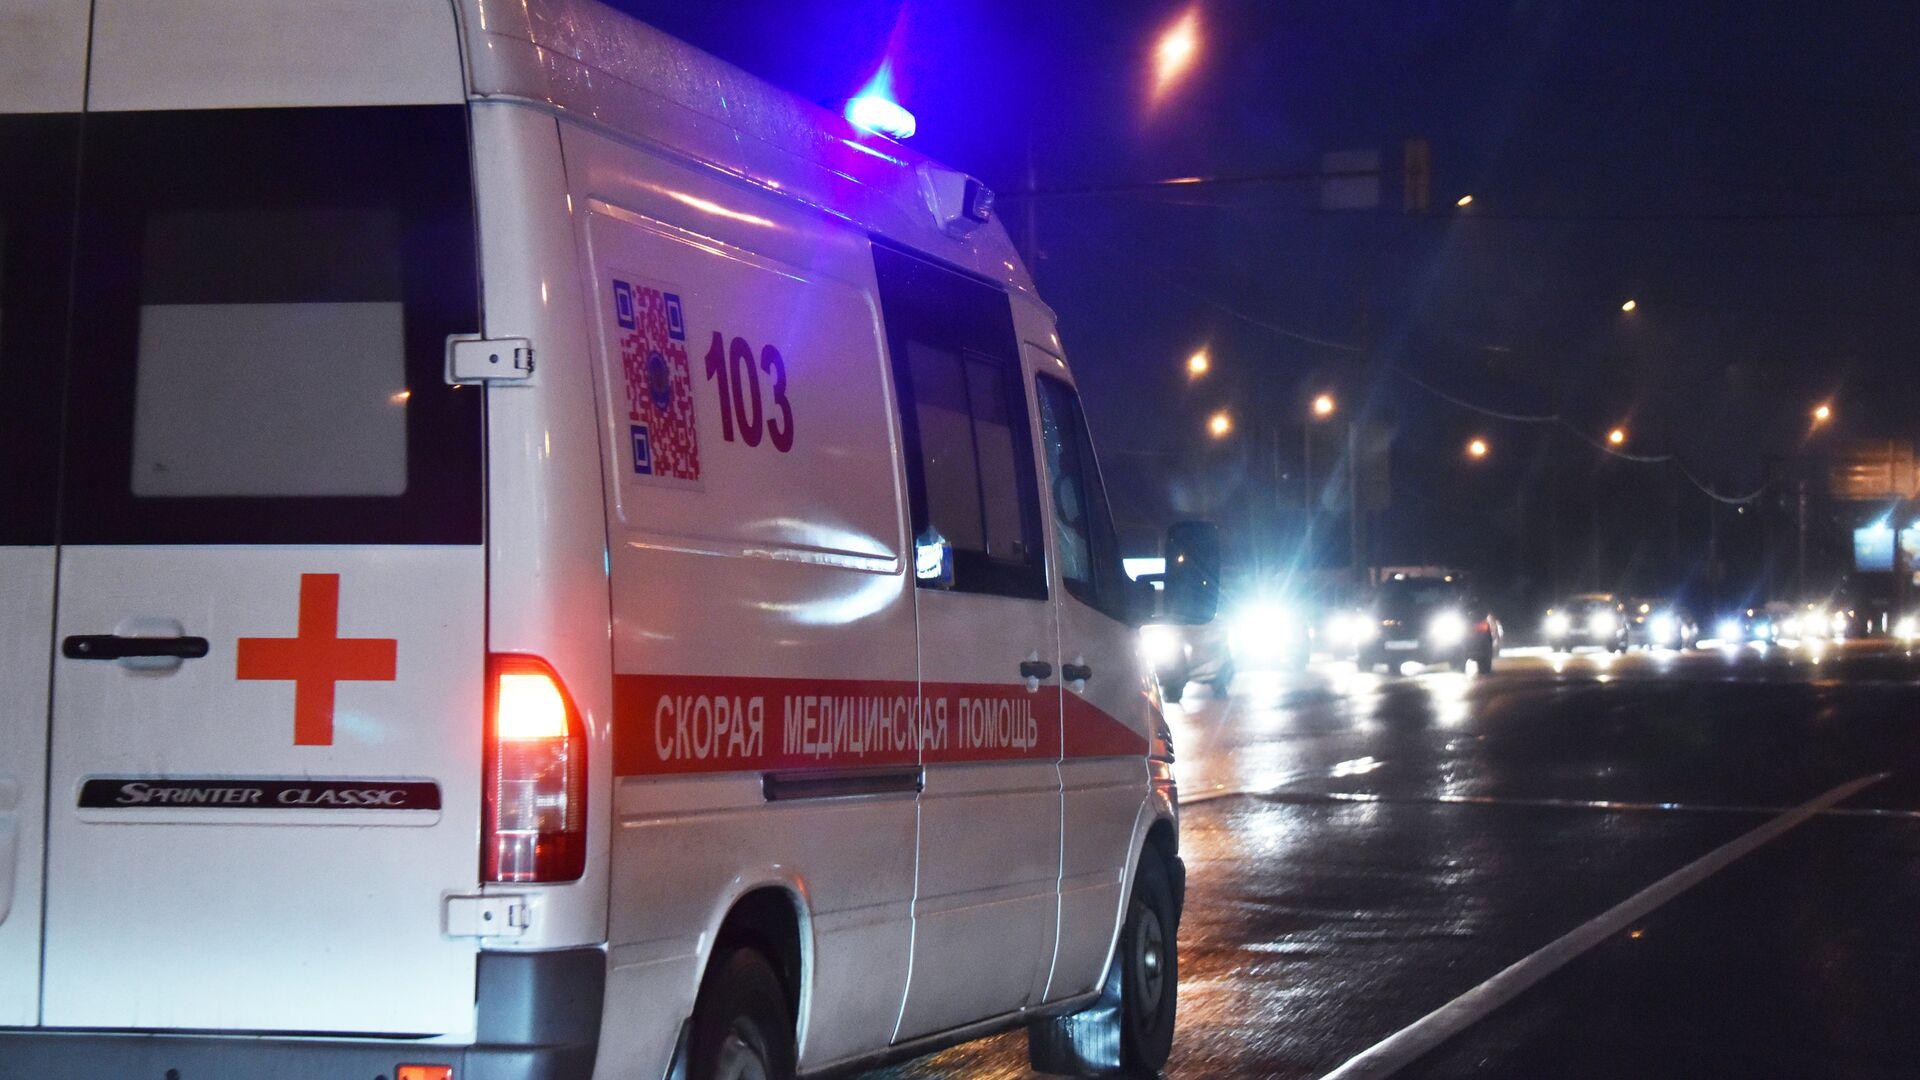 Ambulanza in Russia - Sputnik Italia, 1920, 08.09.2021